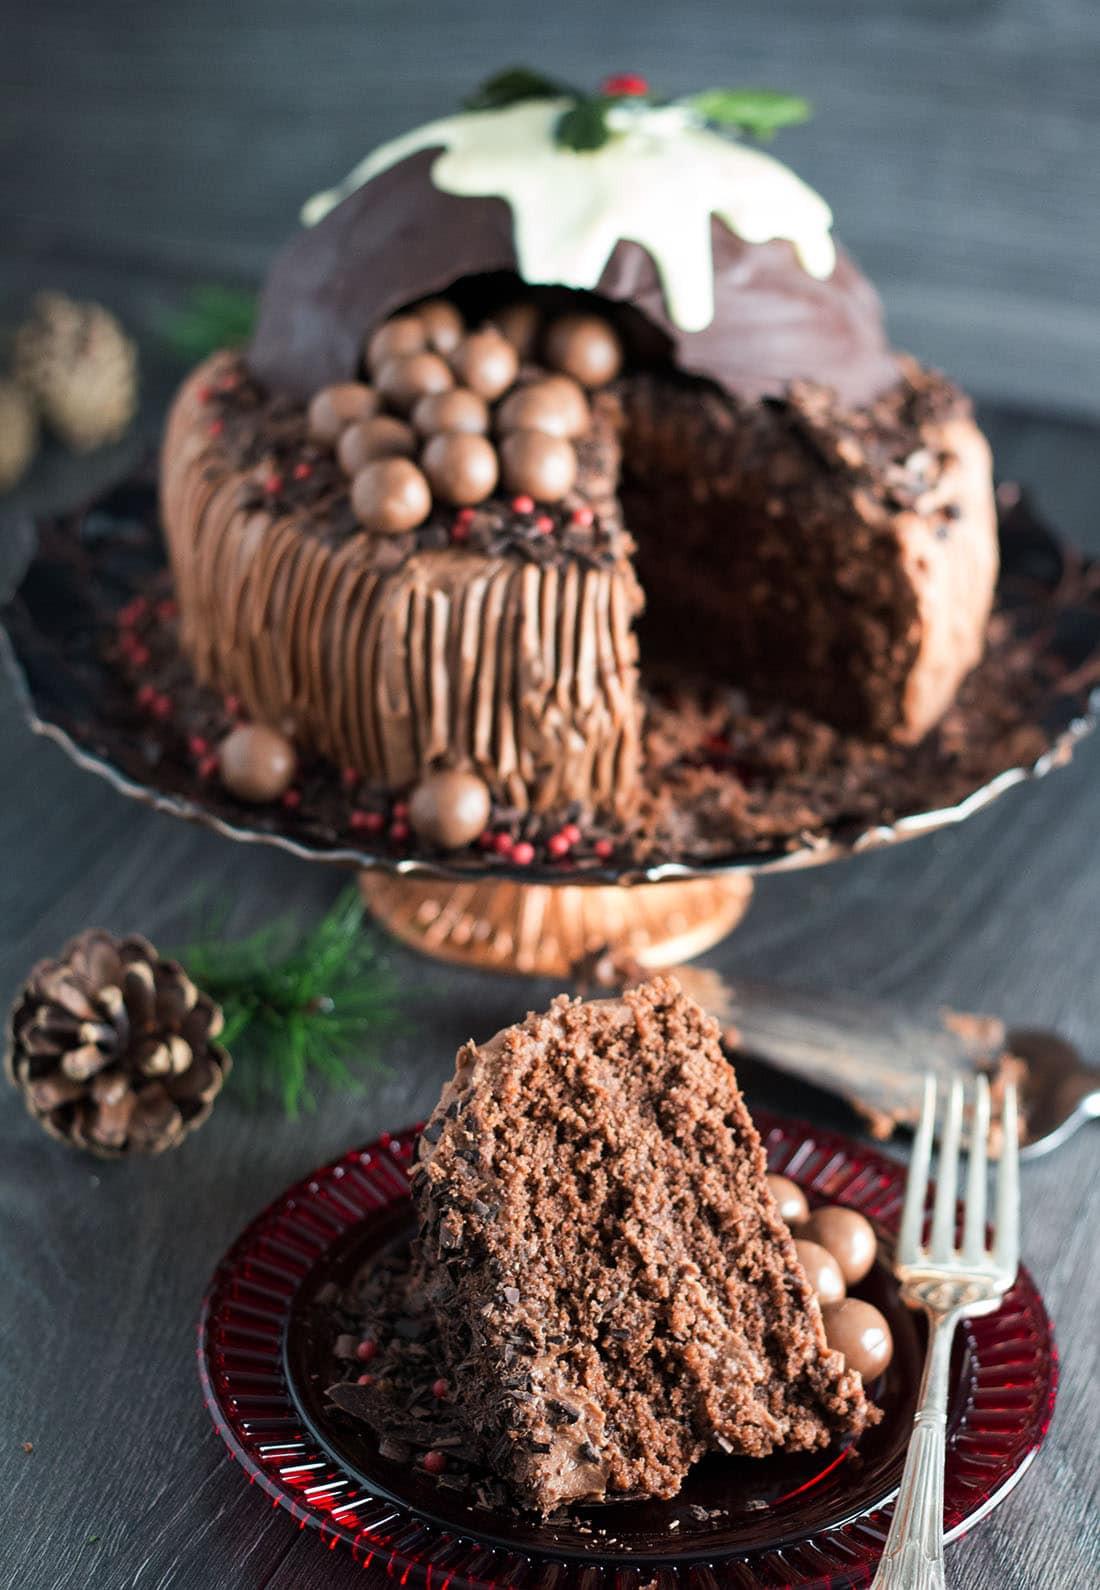 Chocolate Christmas Cake  Chocolate Christmas Smash Cake Smash it open to reveal